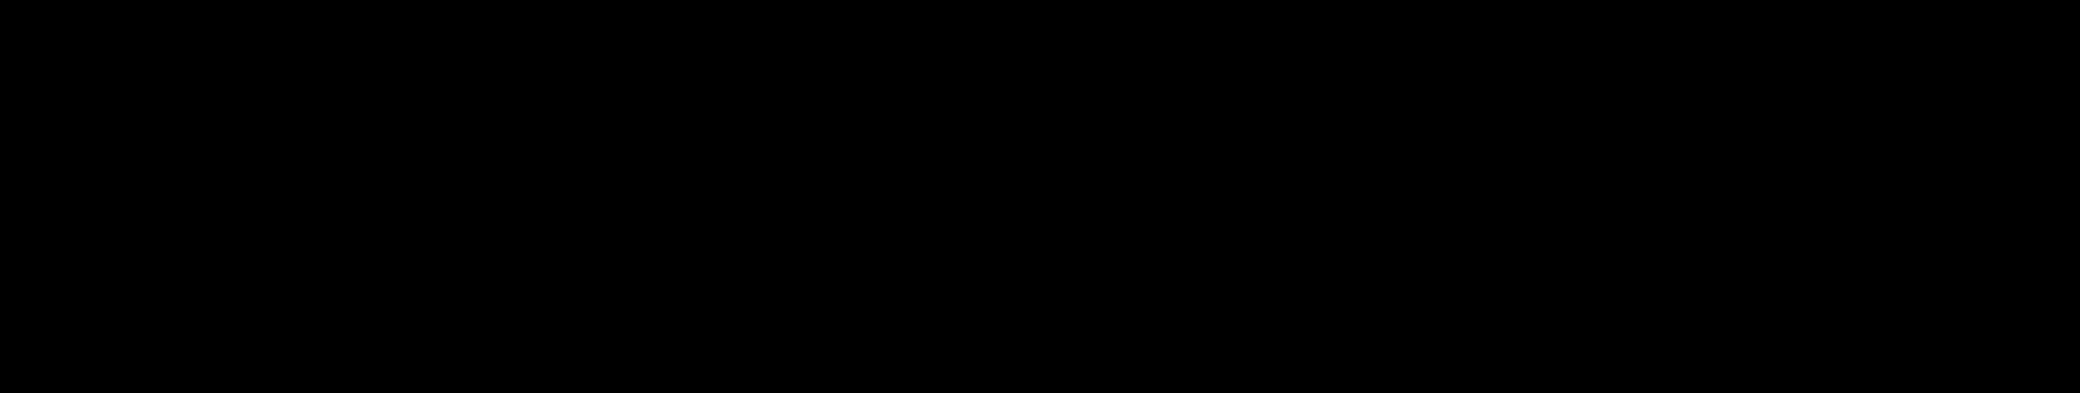 OrderGrid logo